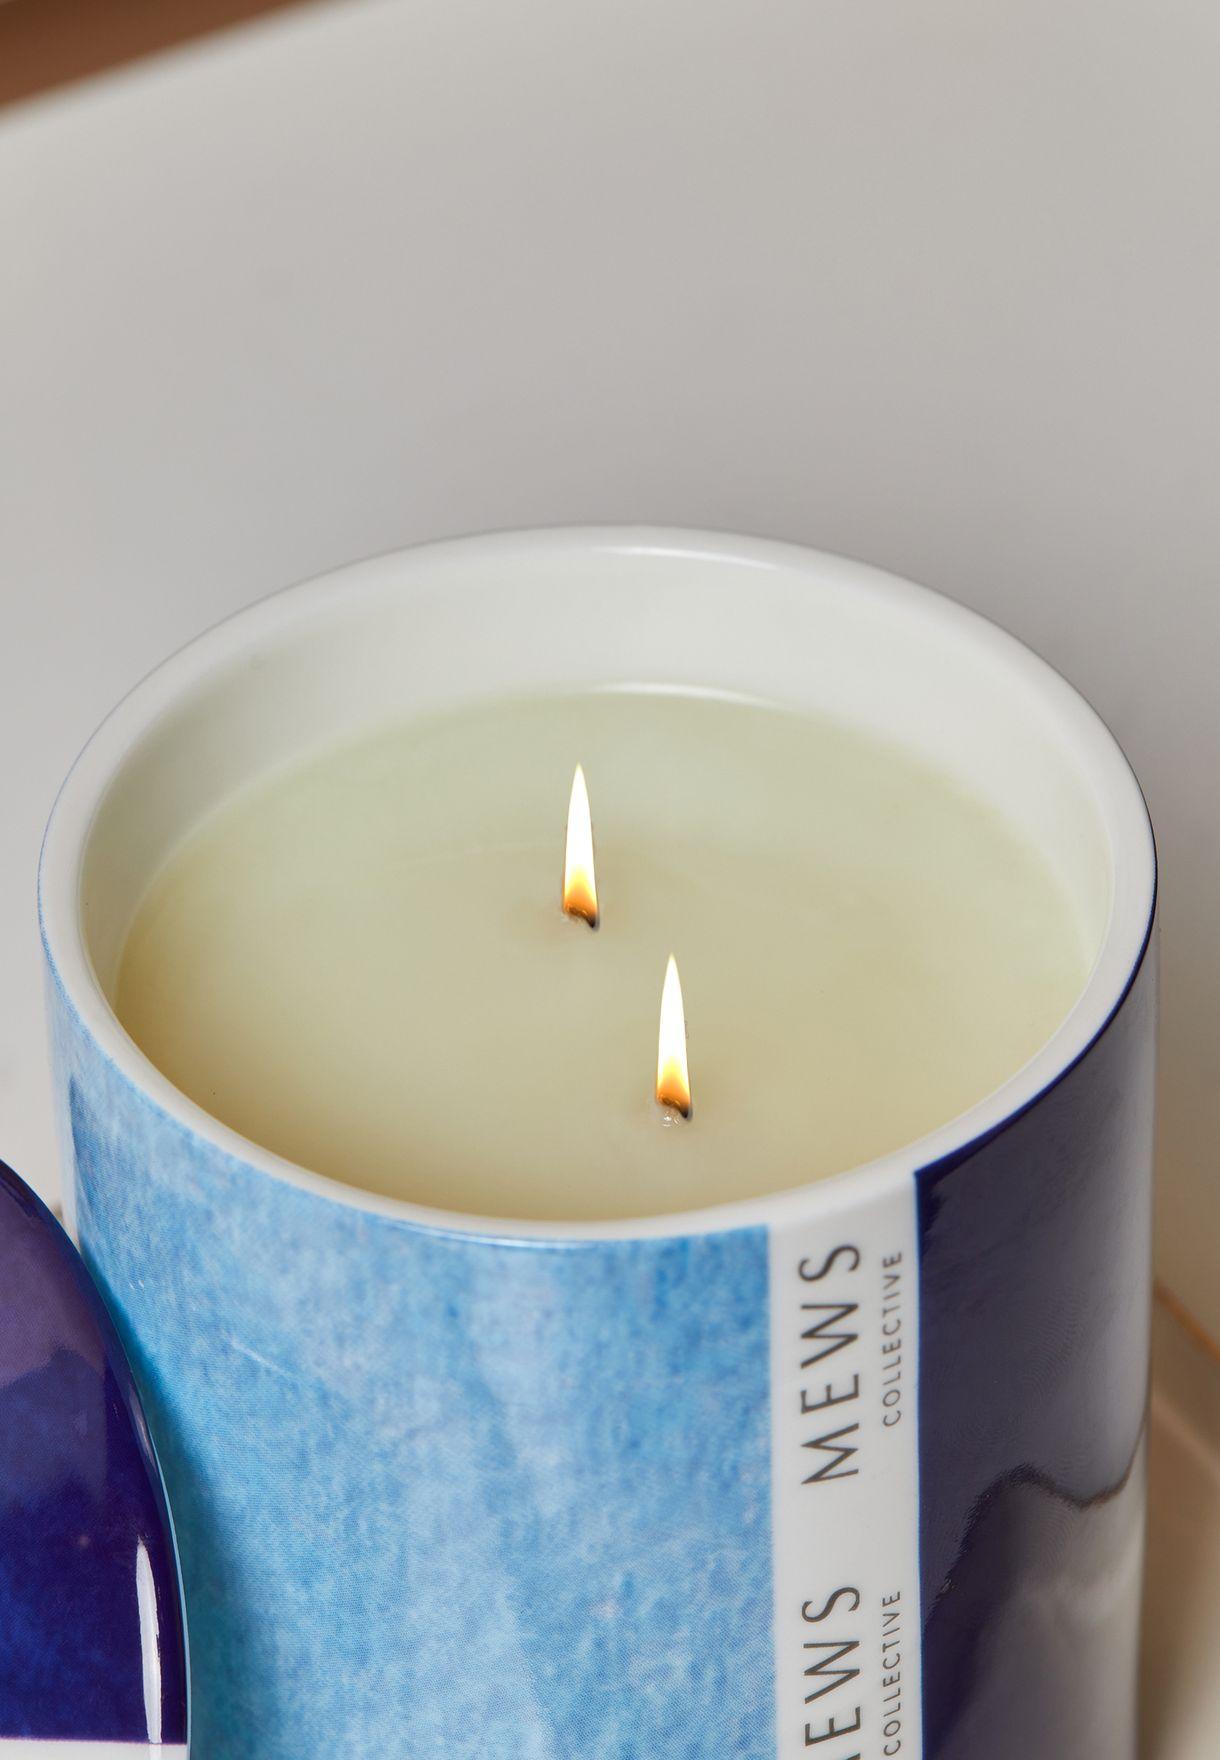 Seasalt & Amber Candle 320g